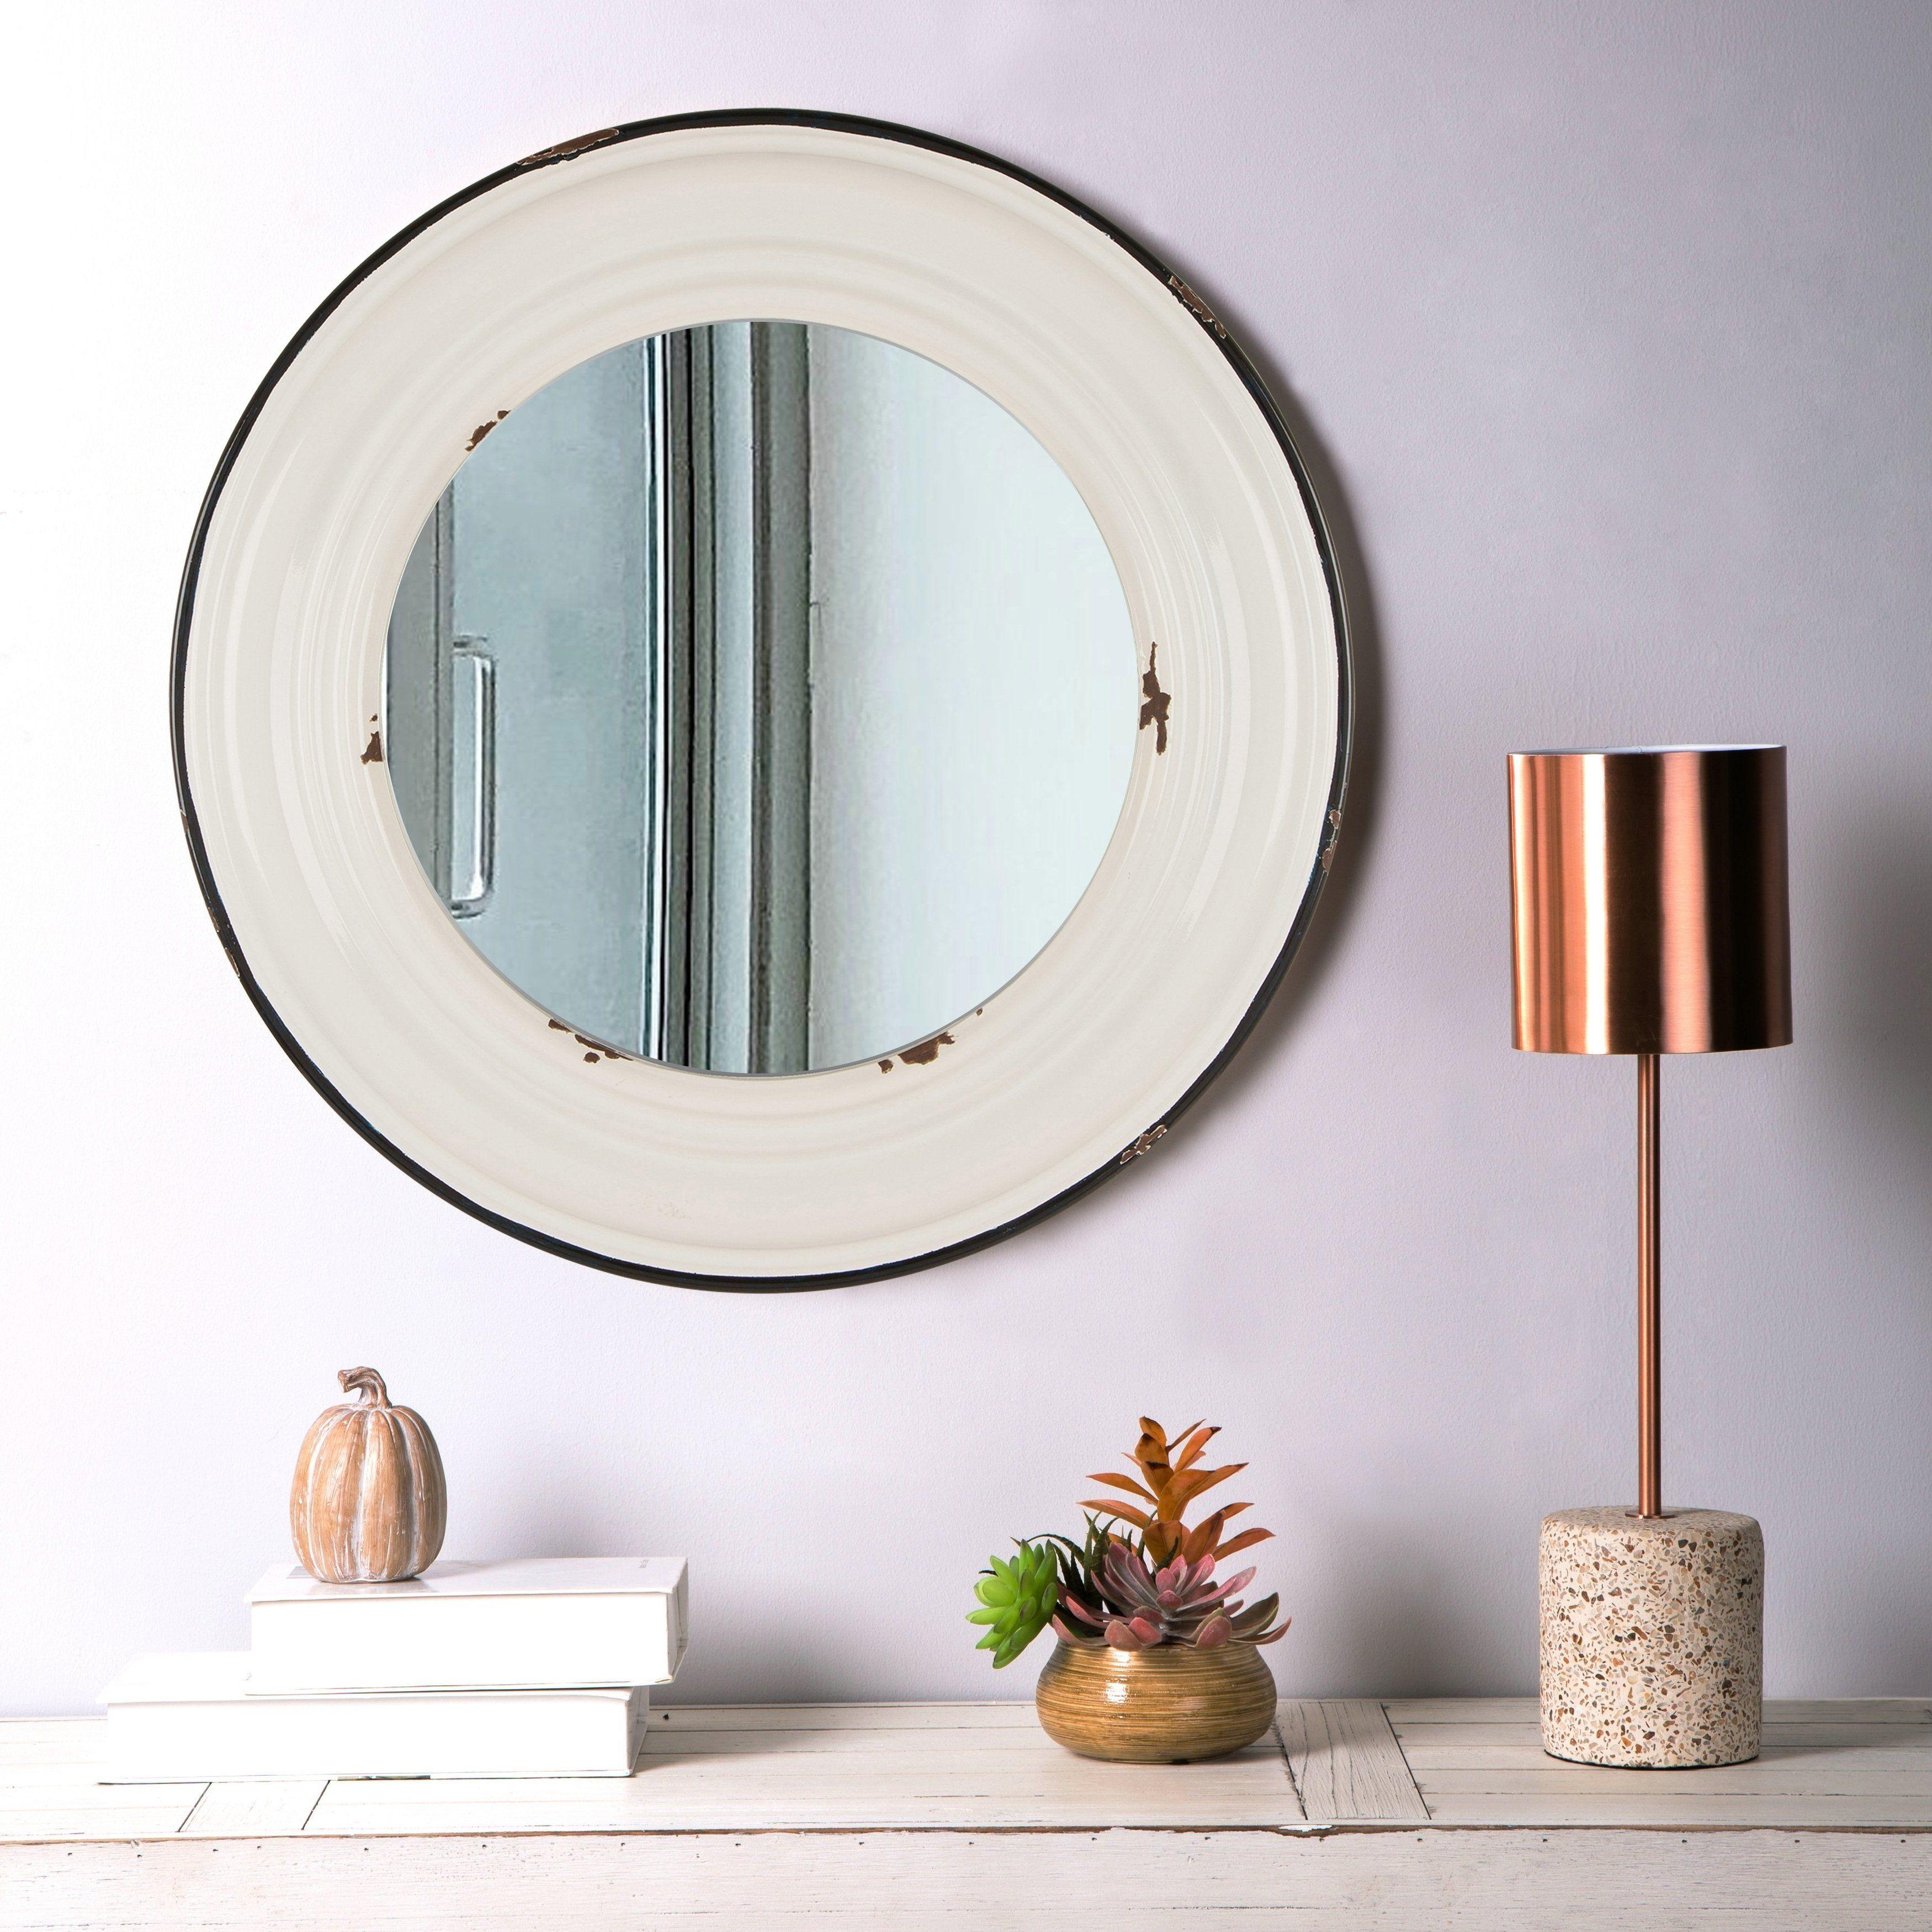 Online Shopping Bedding Furniture Electronics Jewelry Clothing More Farmhouse Mirrors White Farmhouse Decor